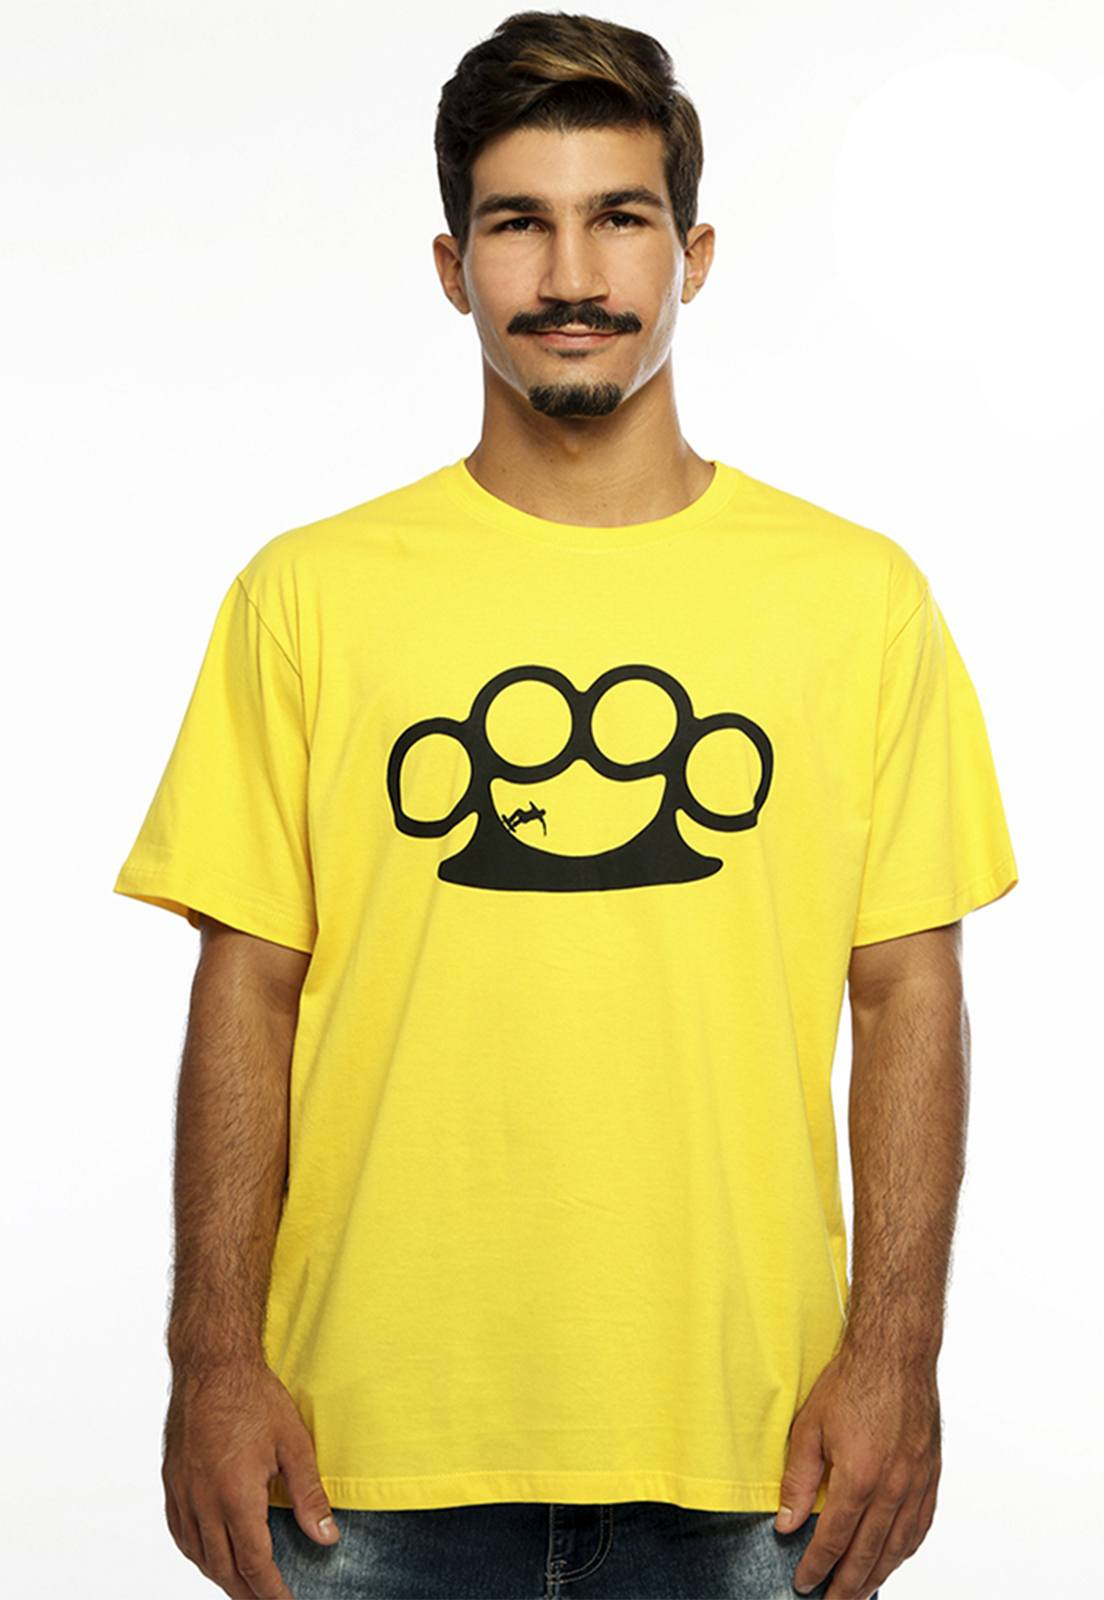 Camiseta masculina amarela Half Pipe - 100% algodão - Hardivision